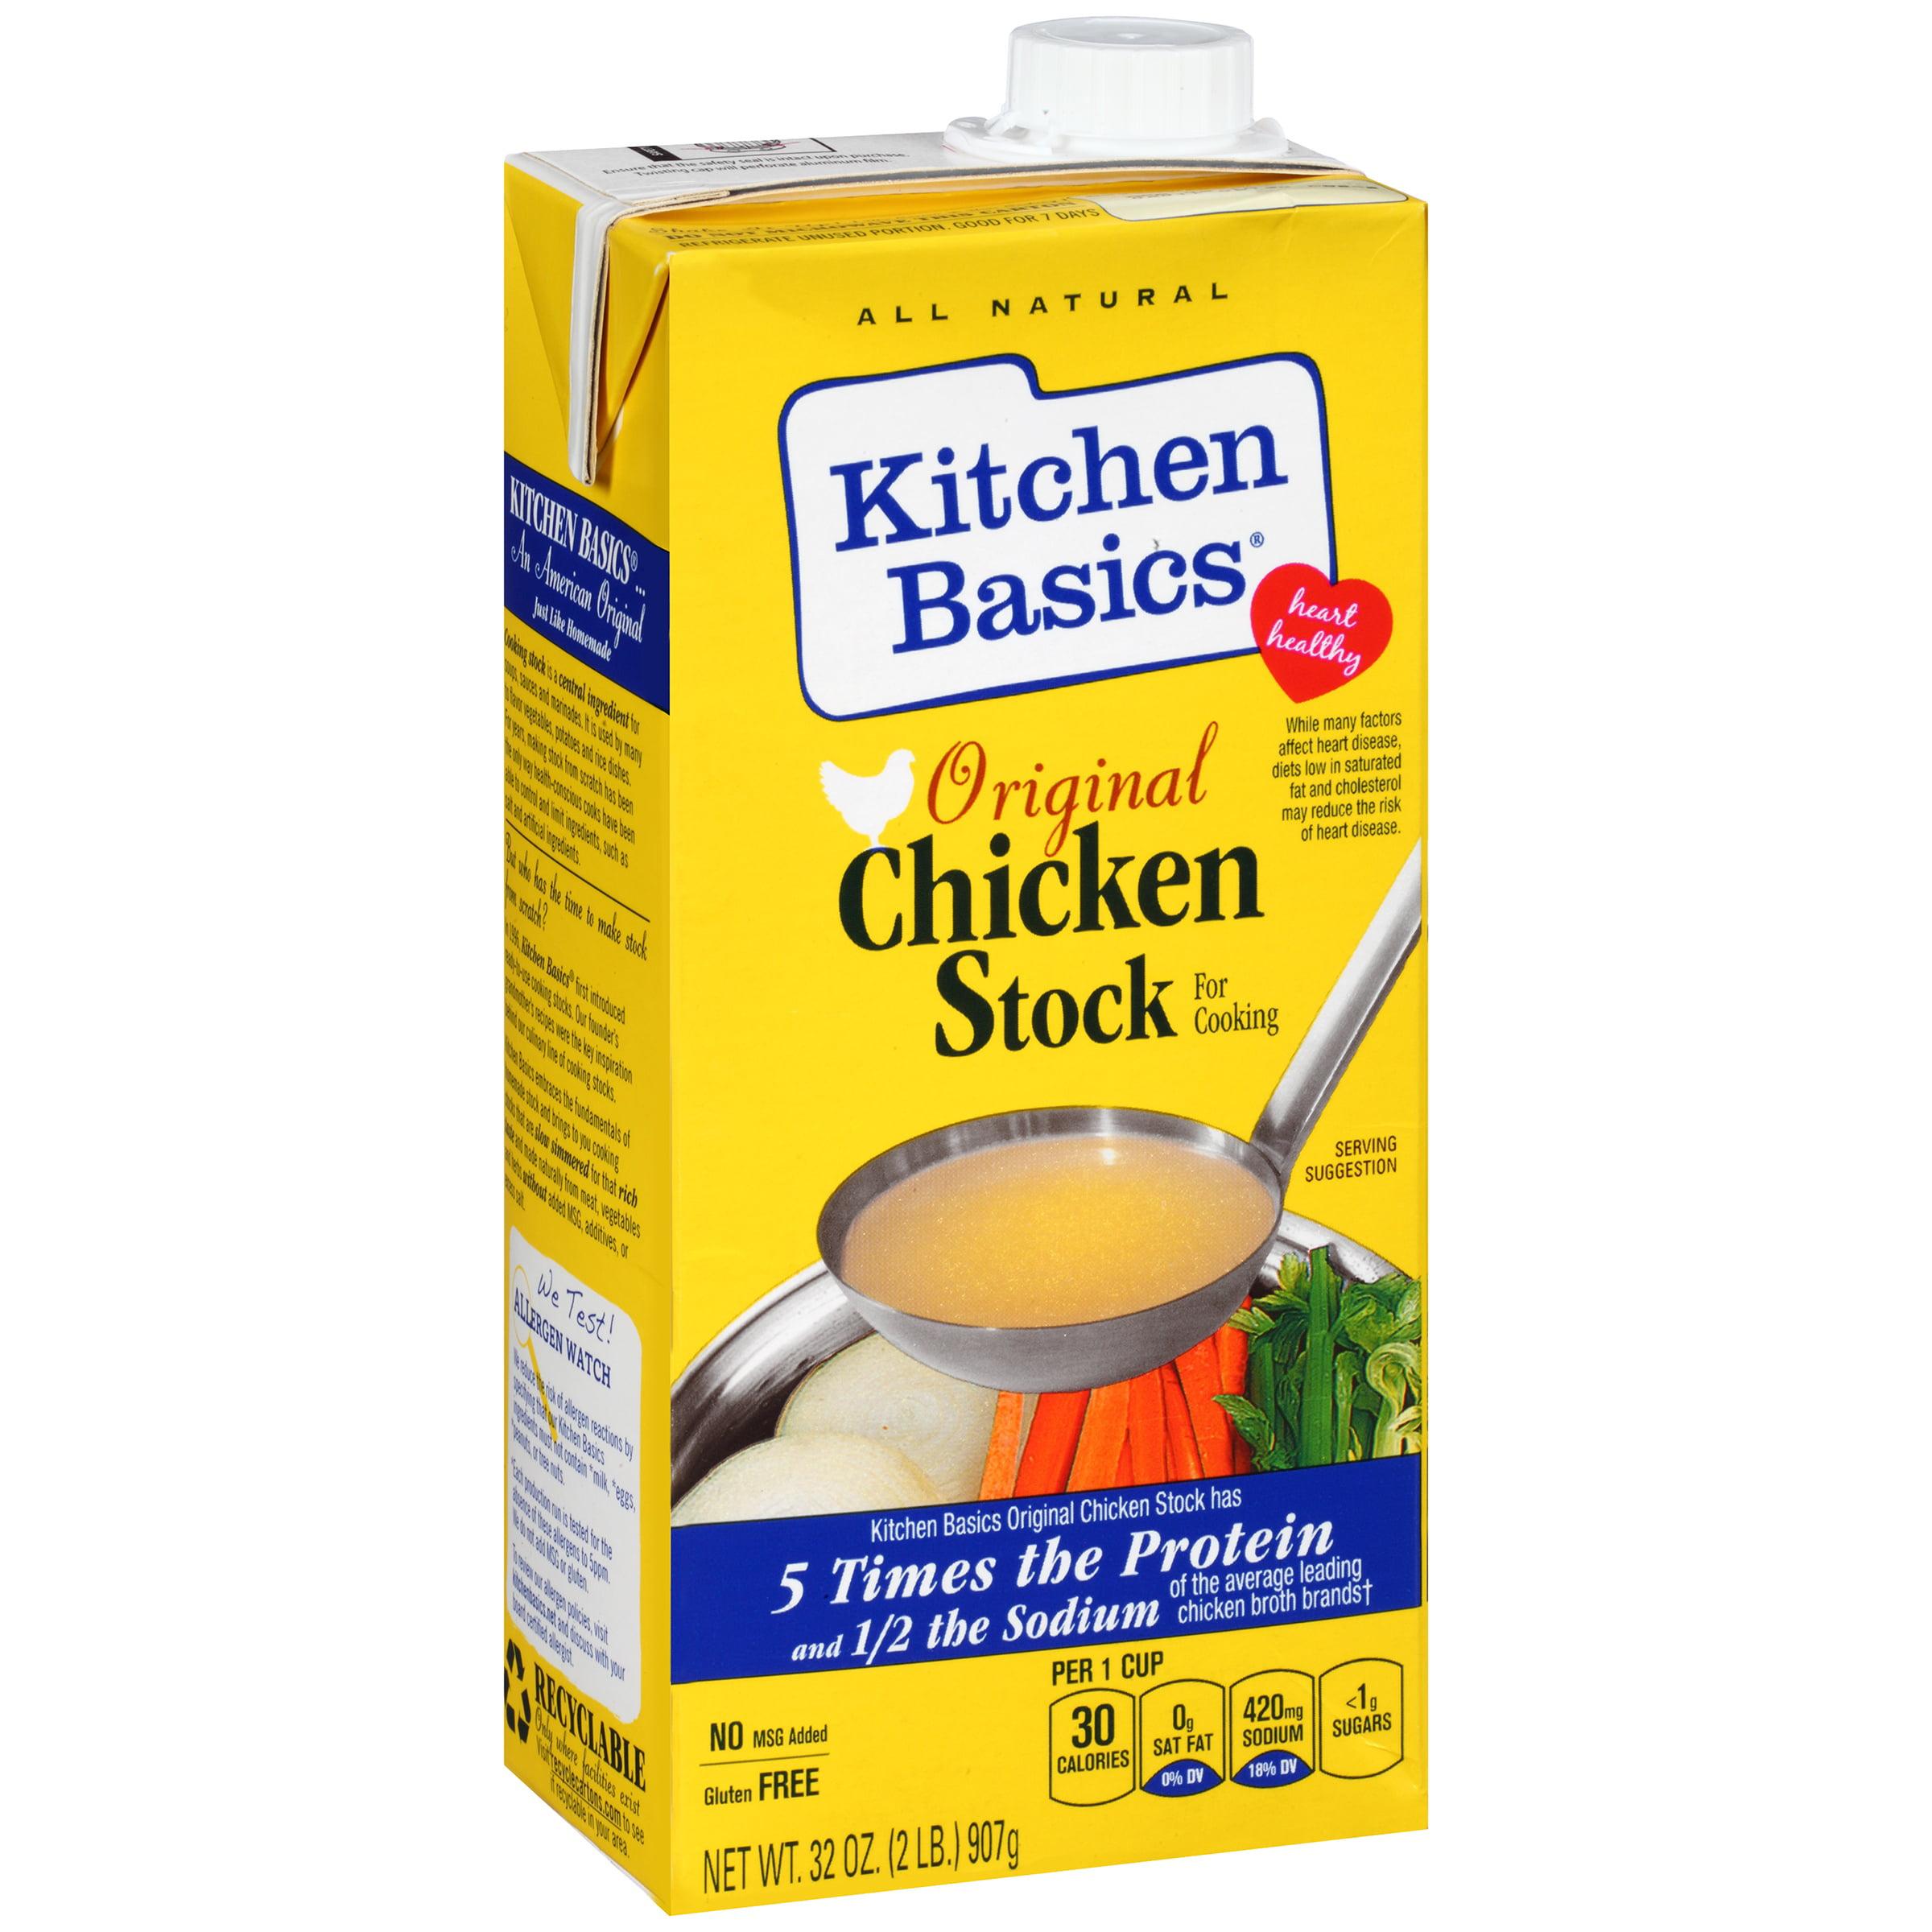 Kitchen Basics Original Chicken Stock, 32 oz - Walmart.com